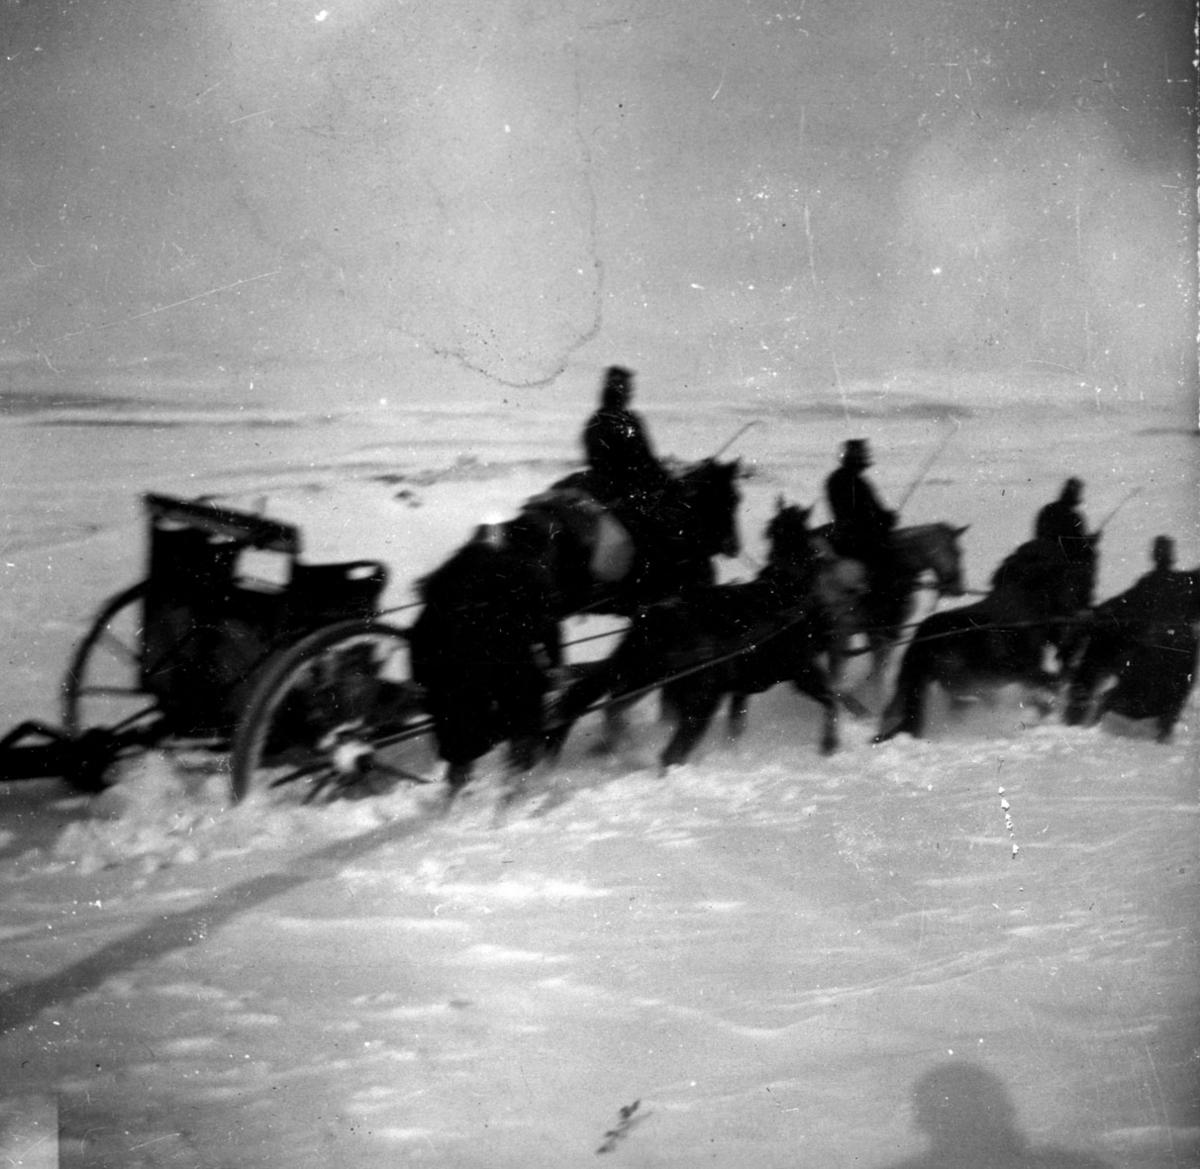 Militær vinterøvelse. Ryttere, hester, kanon fast i snøen